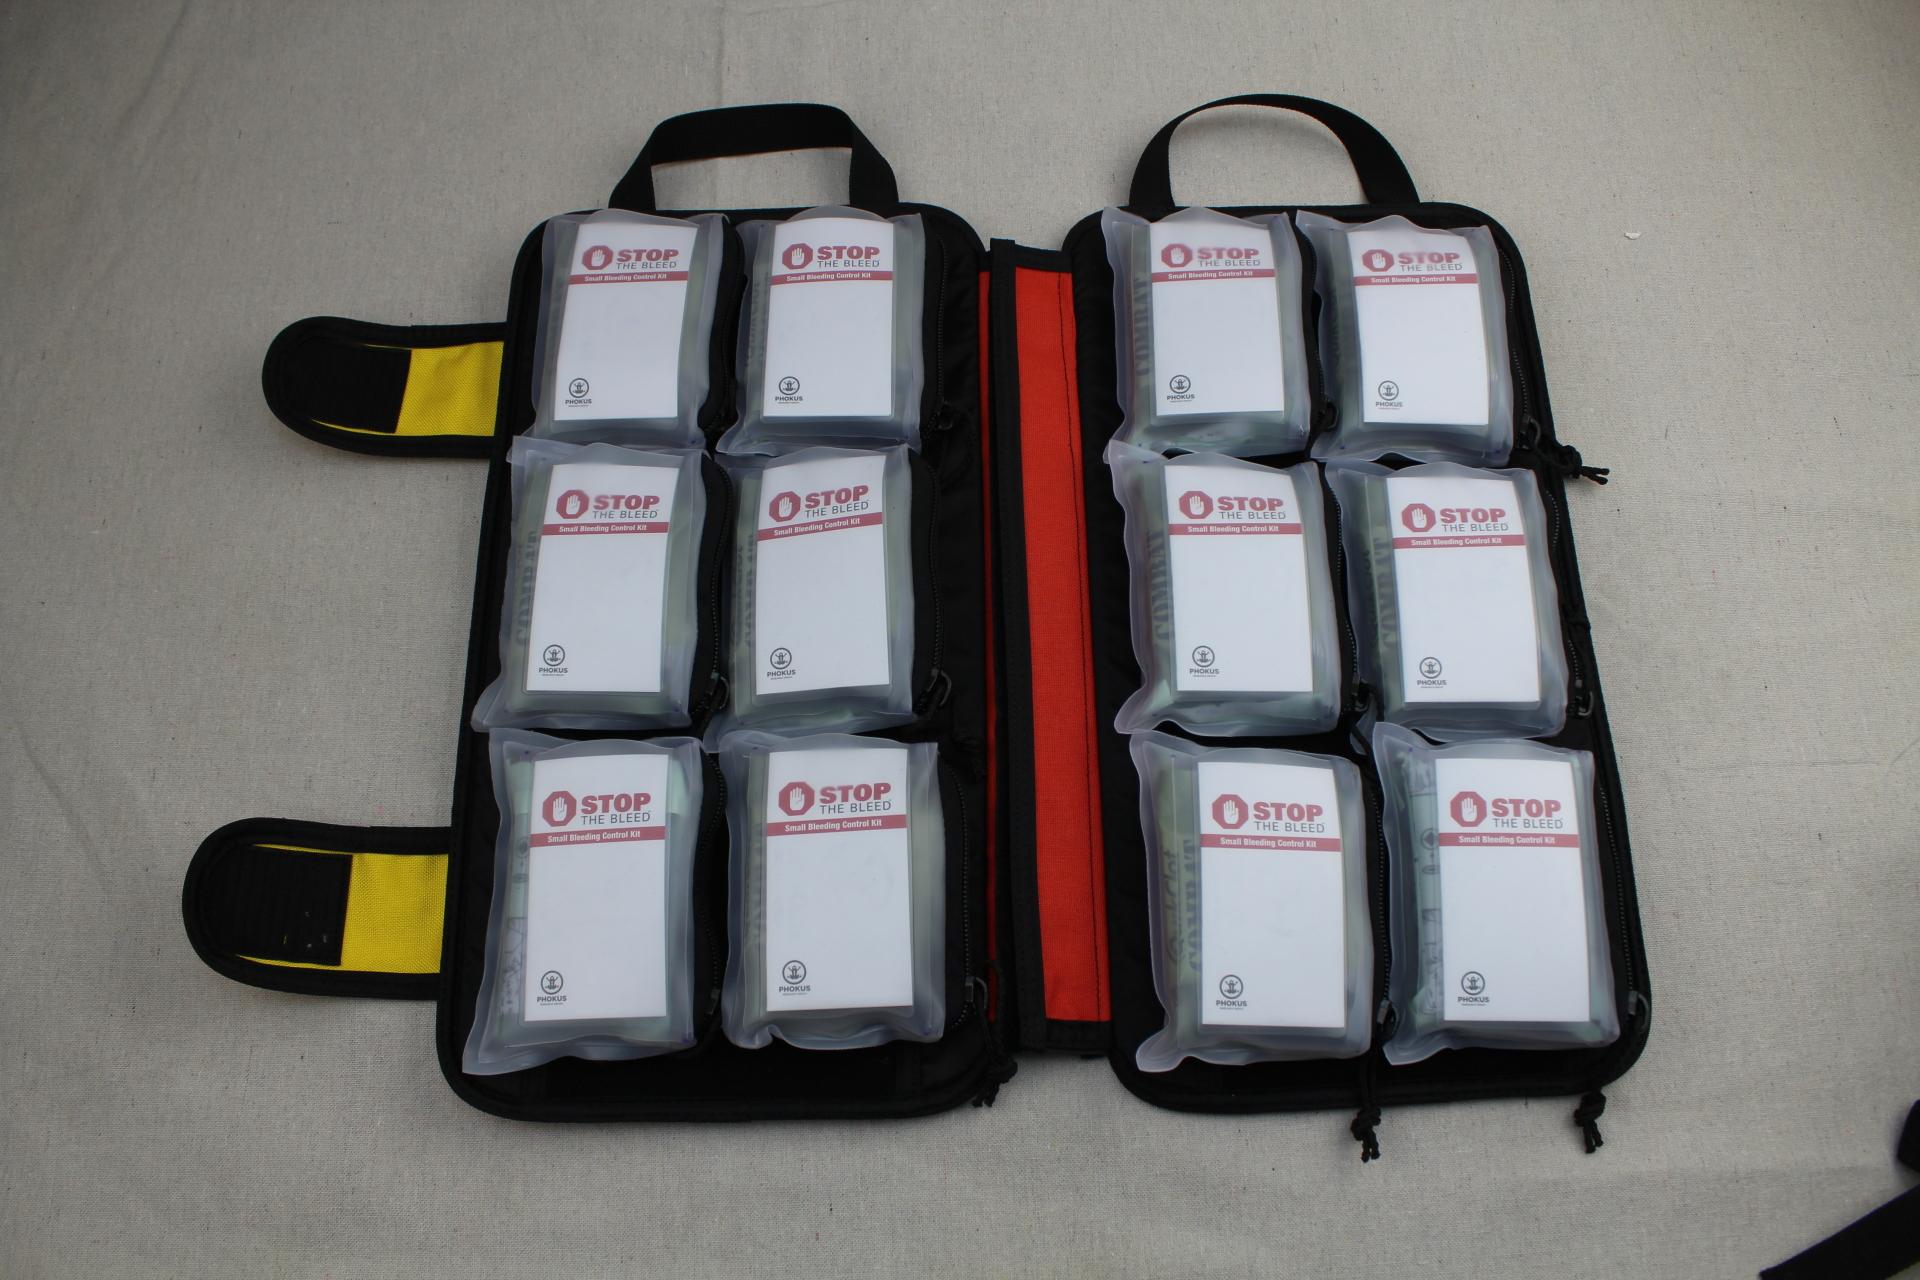 Large Civilian DASH Bag Loaded with Phokus Research Bleeding Control Kits